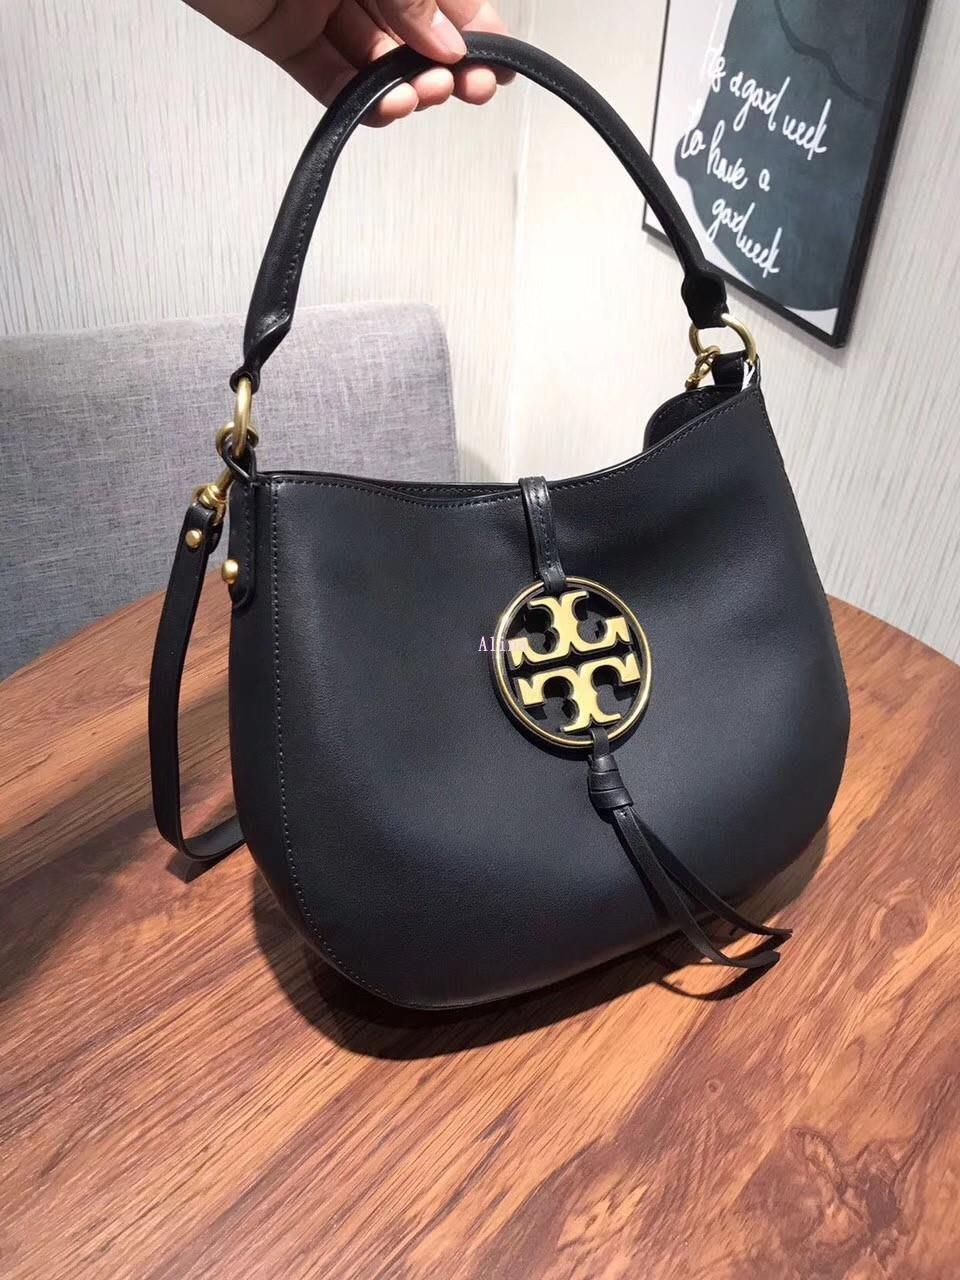 Alina精品代購TORY BURCH 美國輕奢時尚 新款大LOGO 黑色肩背托特包 美國代購